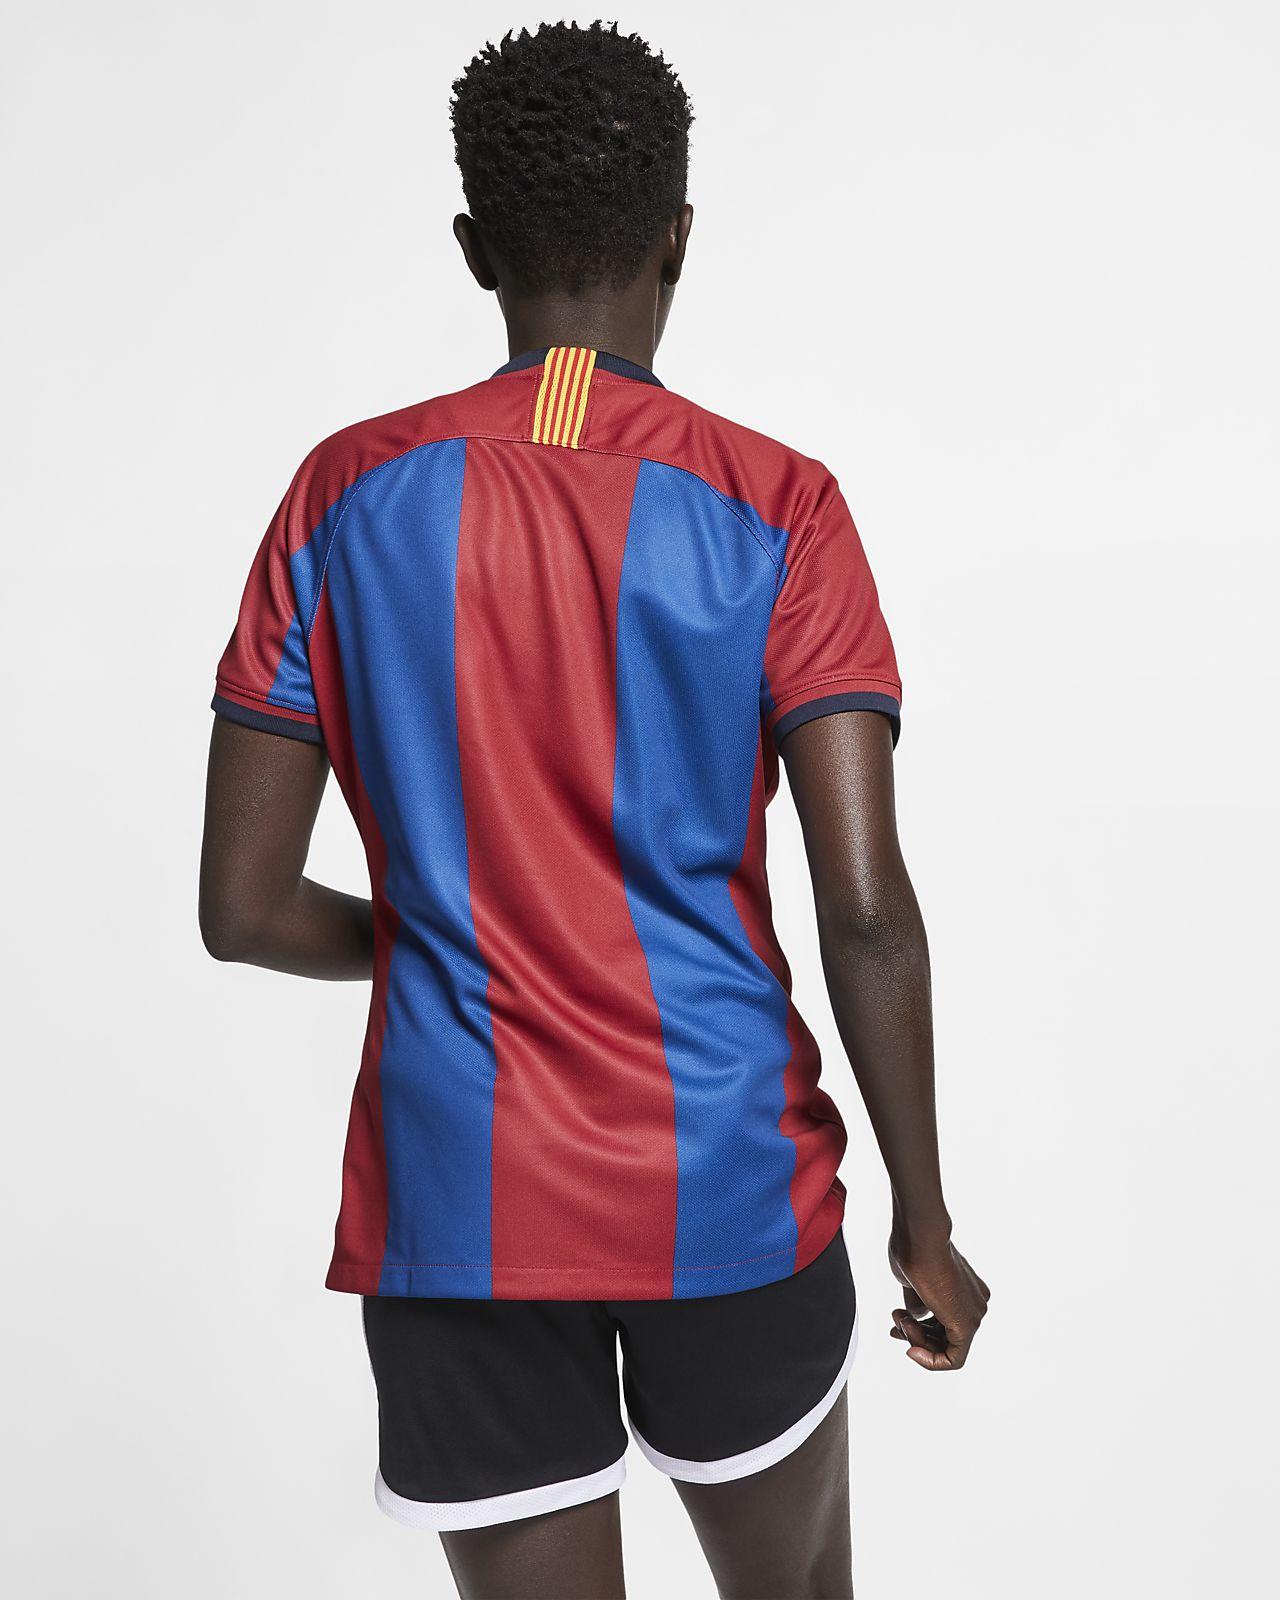 8a191b9d FC Barcelona Stadium '98/99 Women's Football Shirt. Nike.com AU